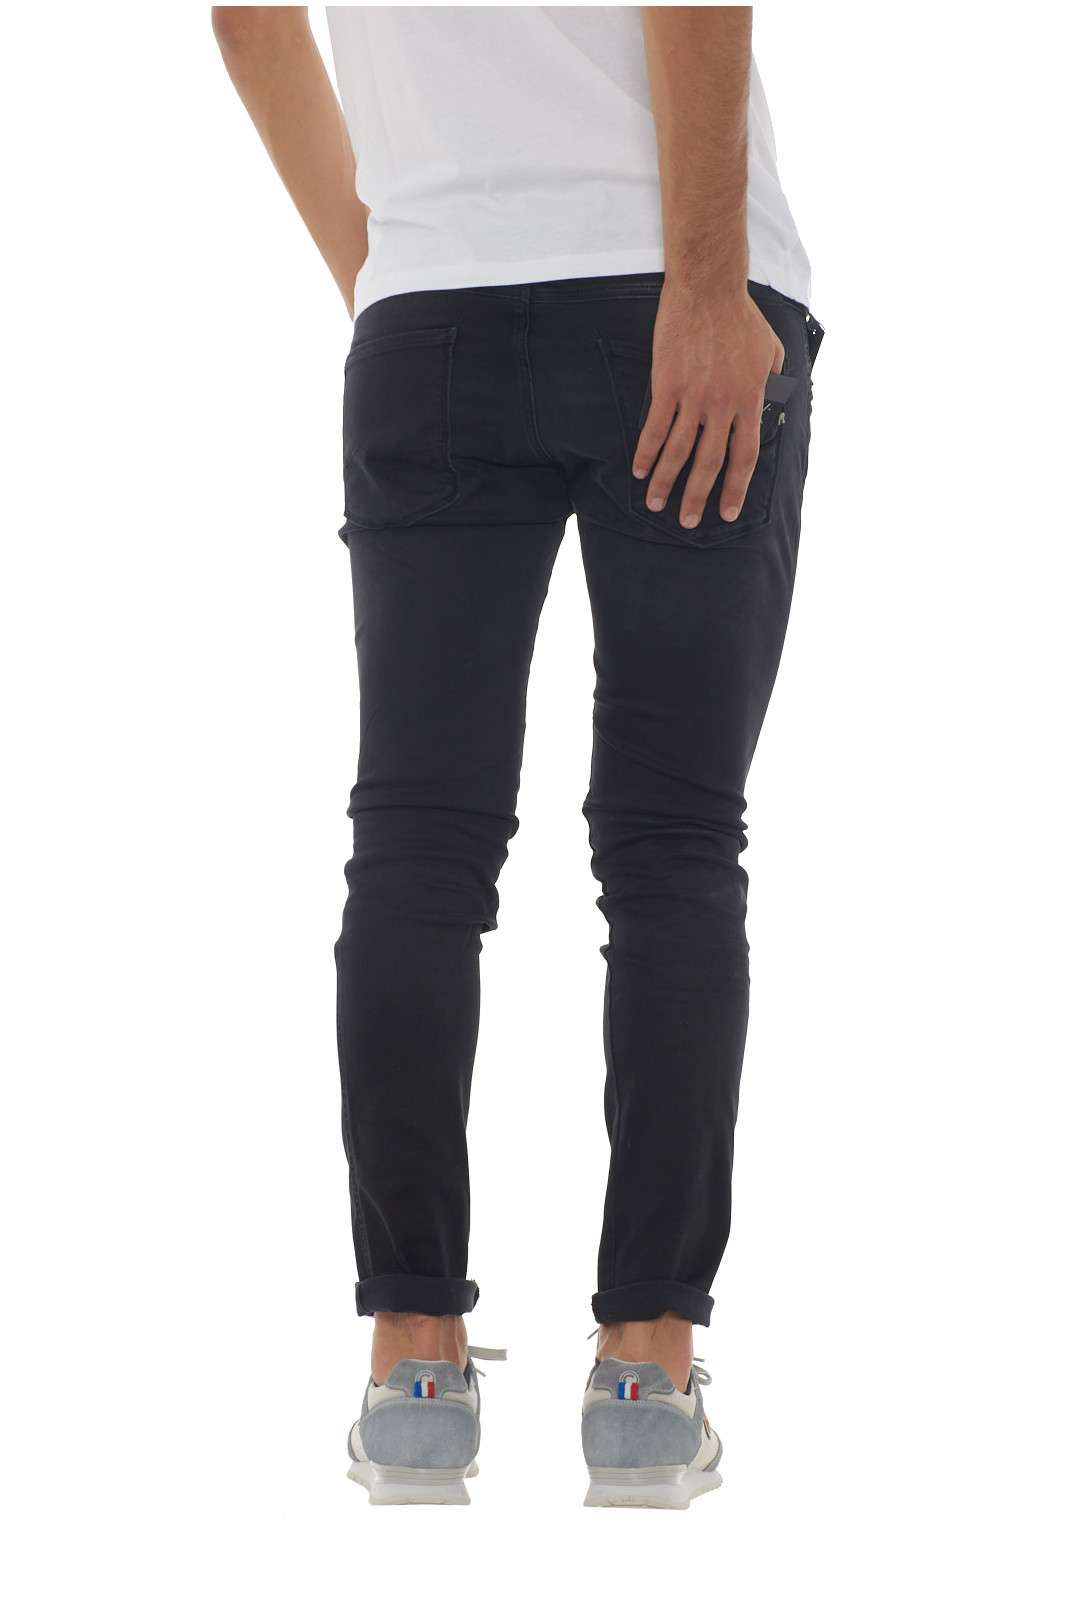 https://www.parmax.com/media/catalog/product/a/i/AI-Outlet_Parmax-Pantalone-Uomo-Replay-M91400066106B-C.jpg